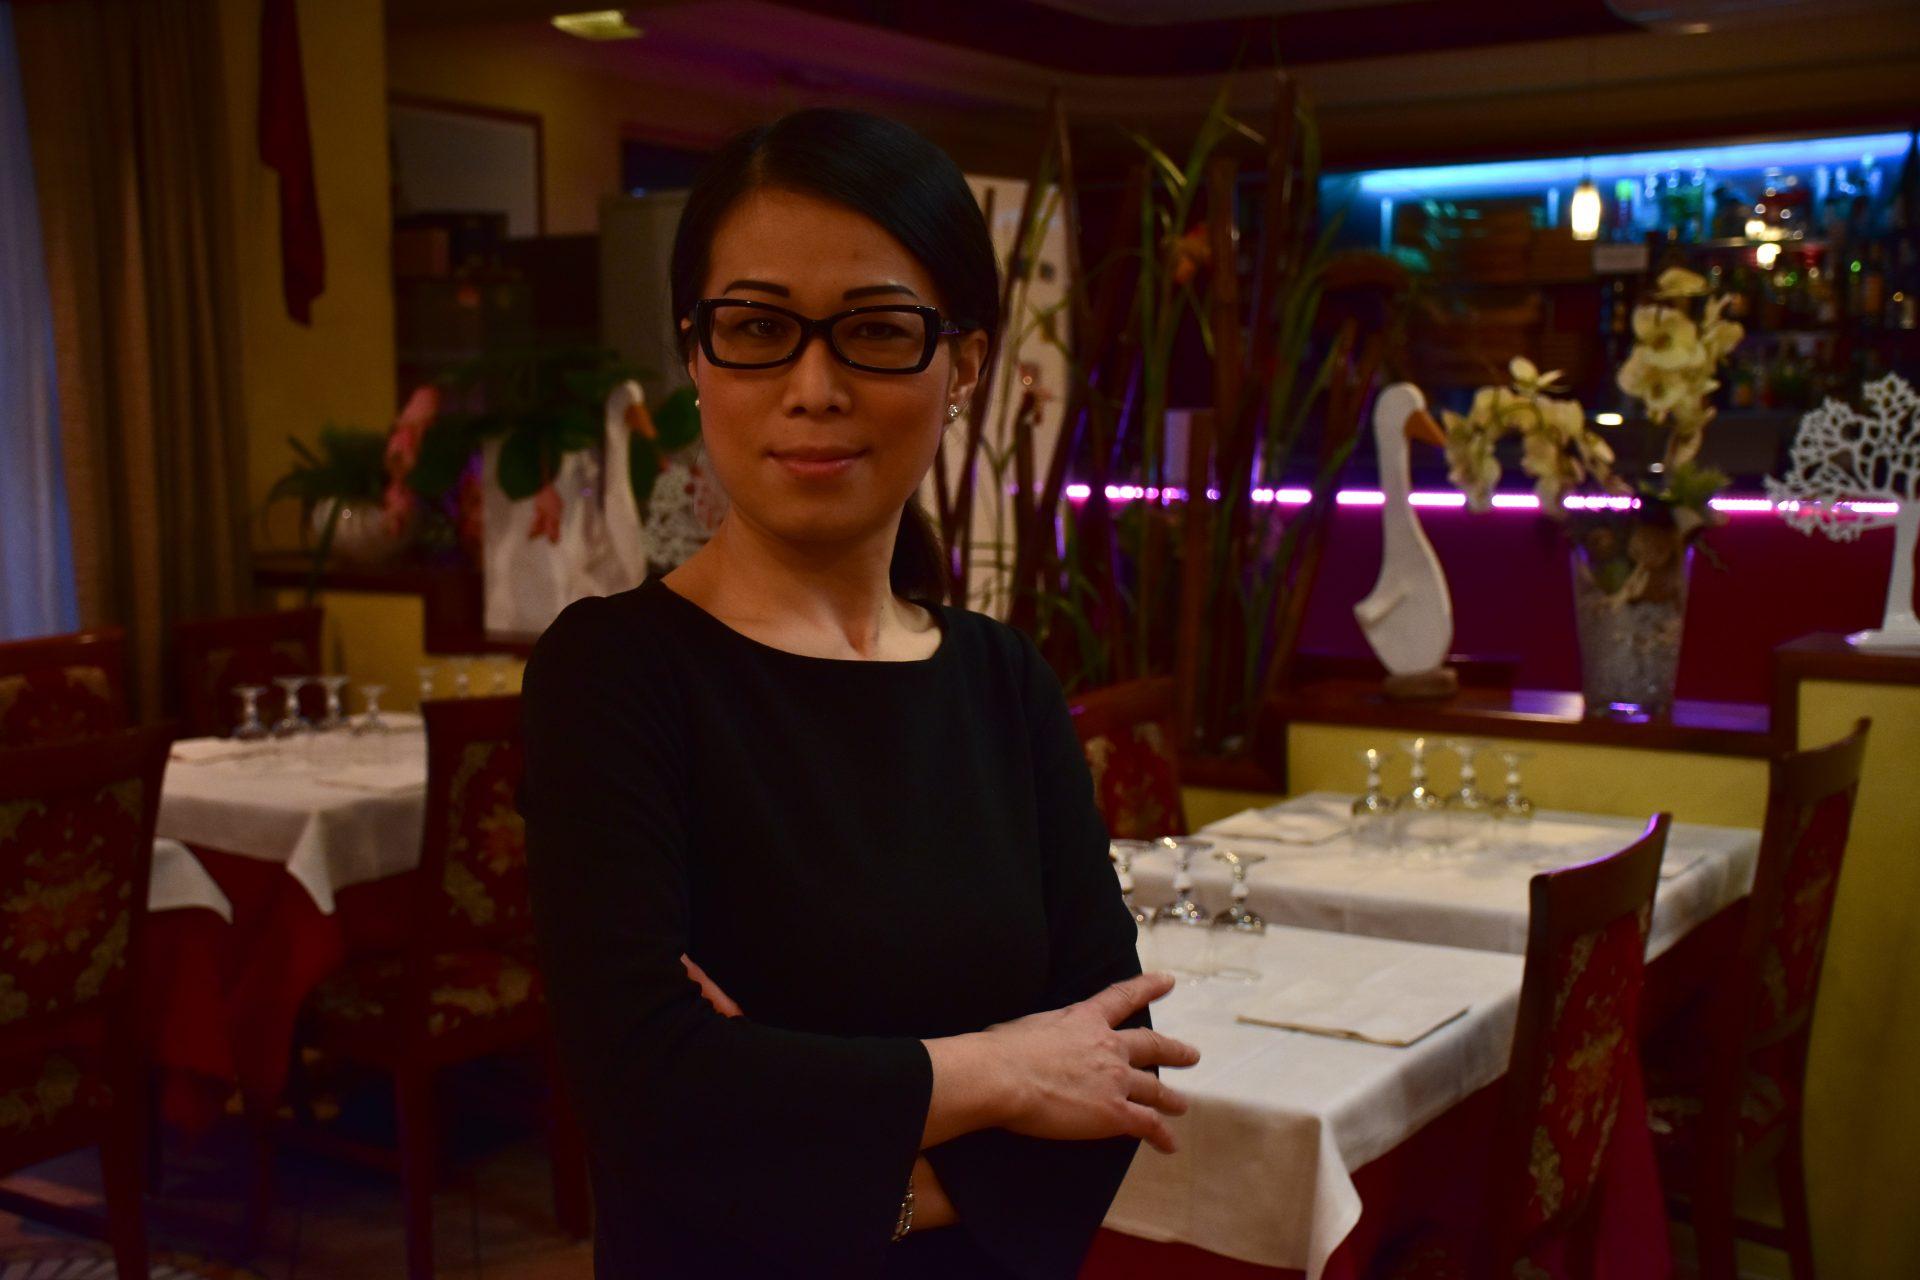 Lucia Yemei Xu Palazzolo